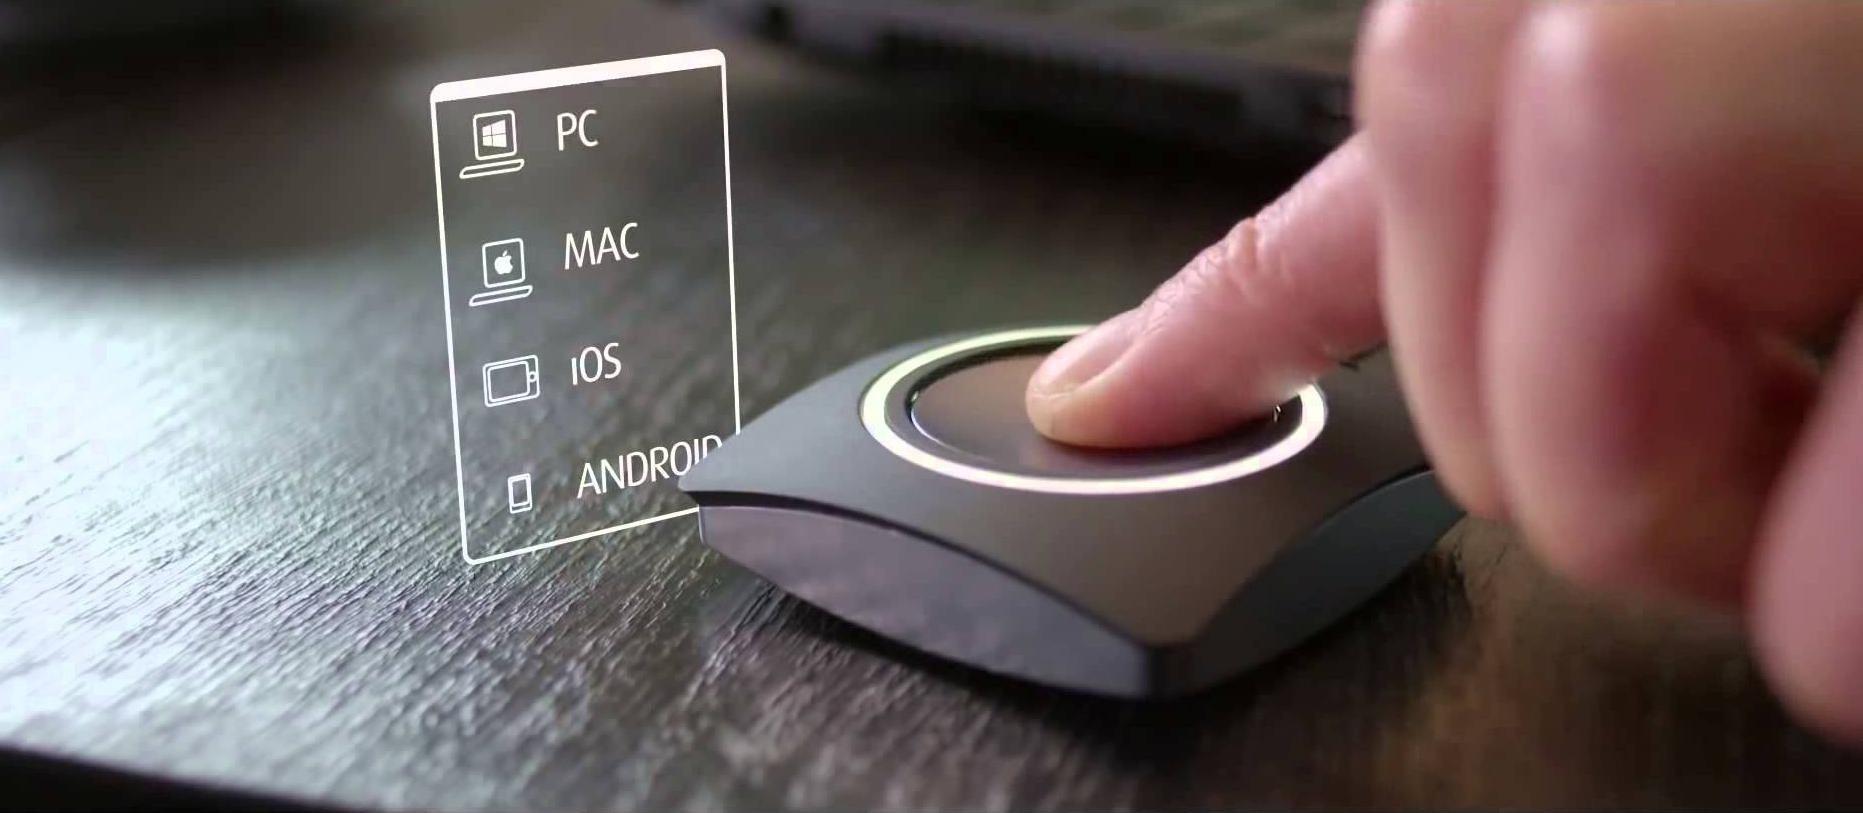 Barco ClickShare – Plug into simplicity, tap into amazing